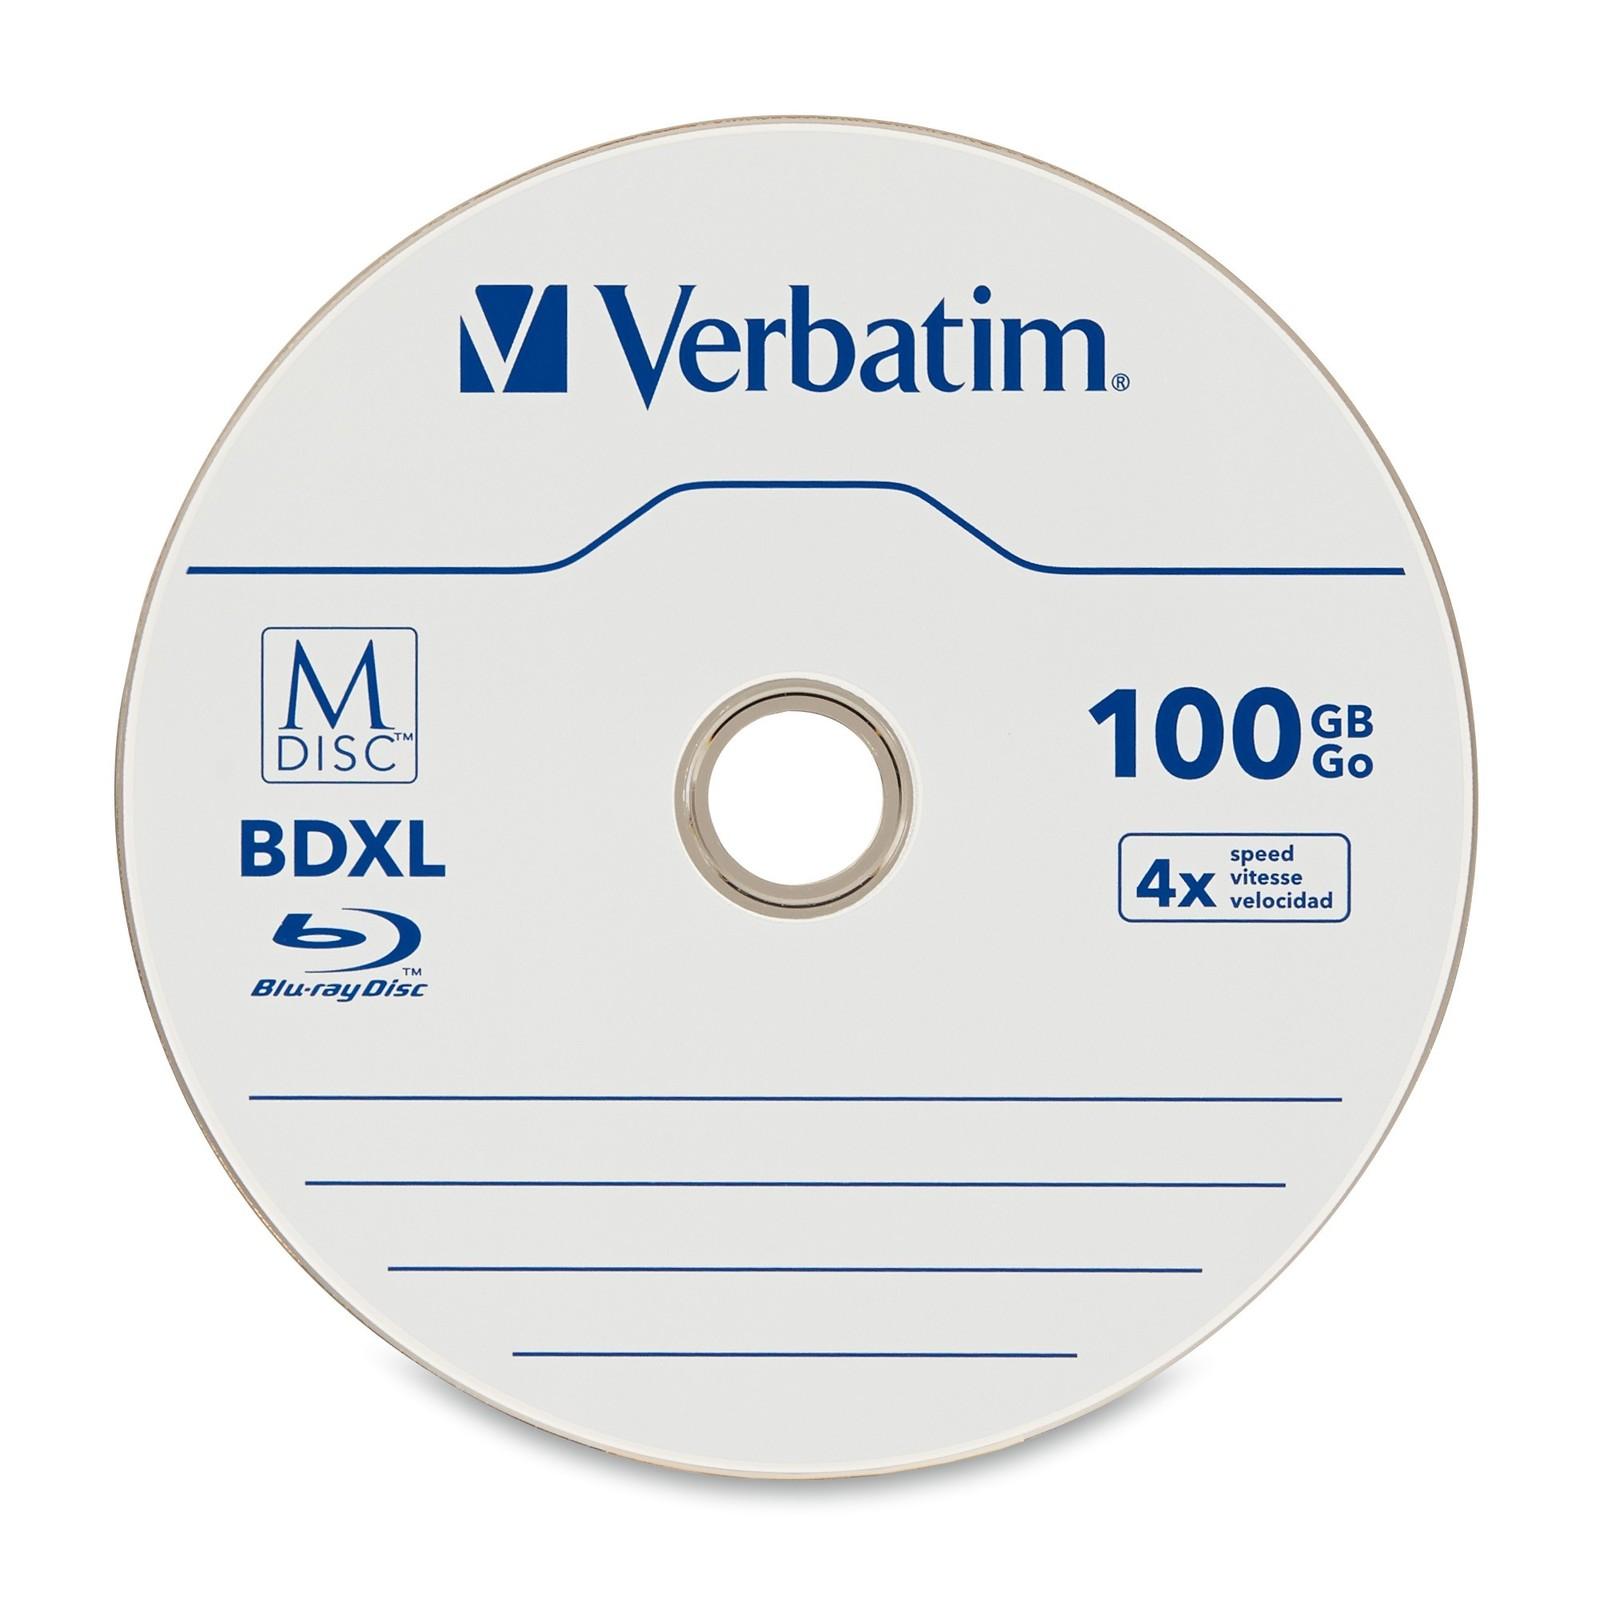 Verbatim M-Disc BDXL 100GB4X (5 Pack) image